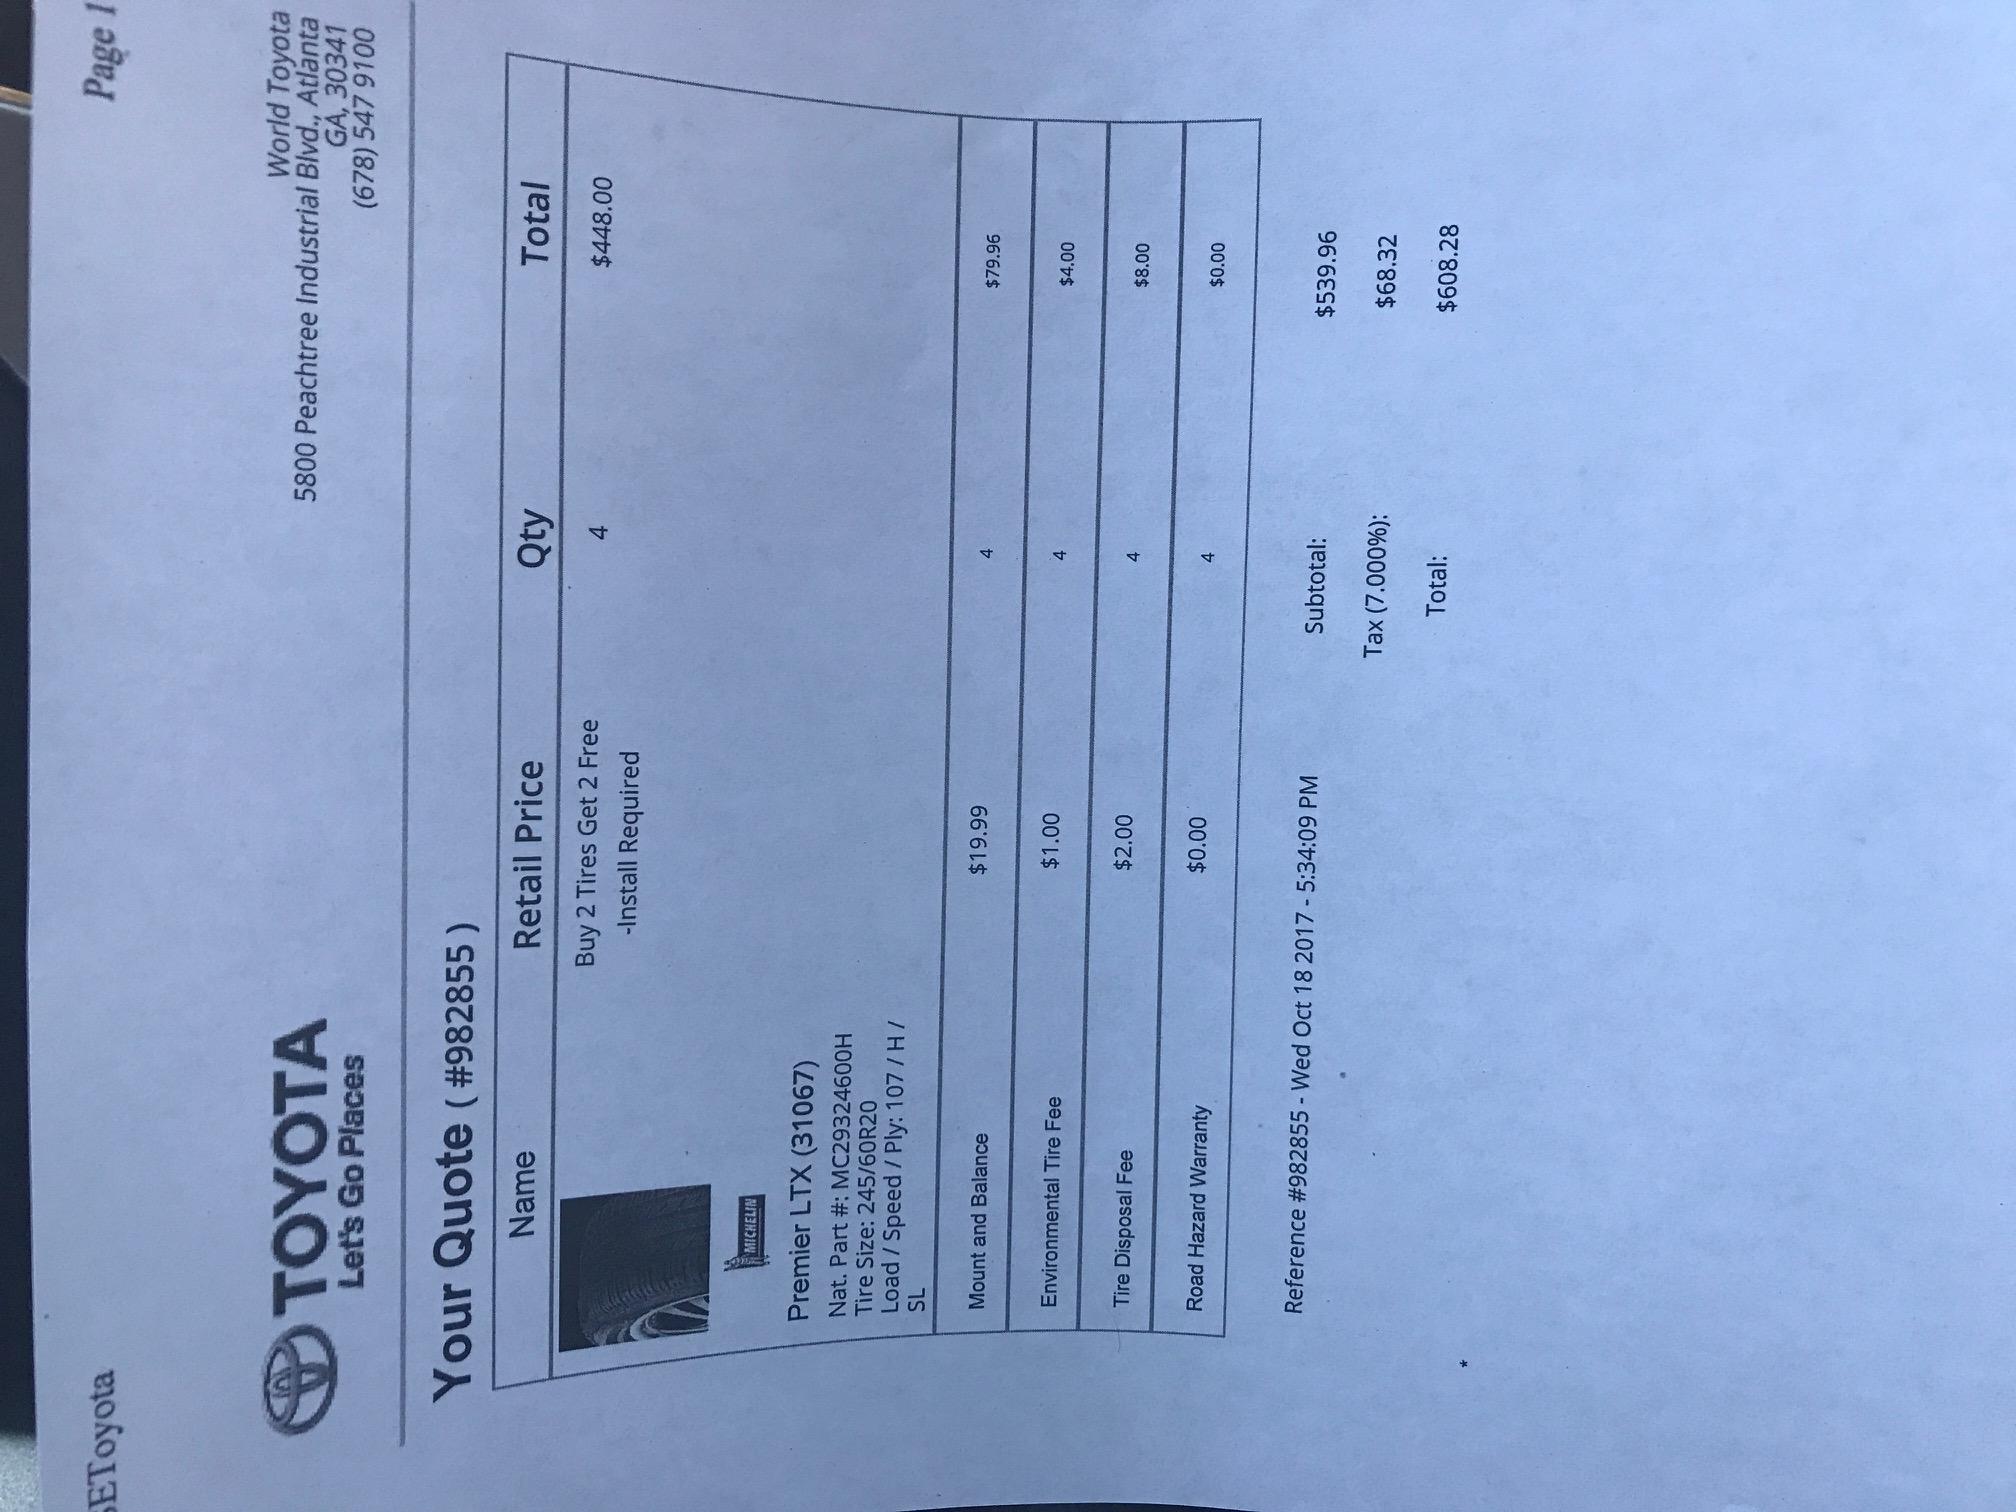 World Toyota (Atlanta Ga) Buy 2 tires, get 2 free